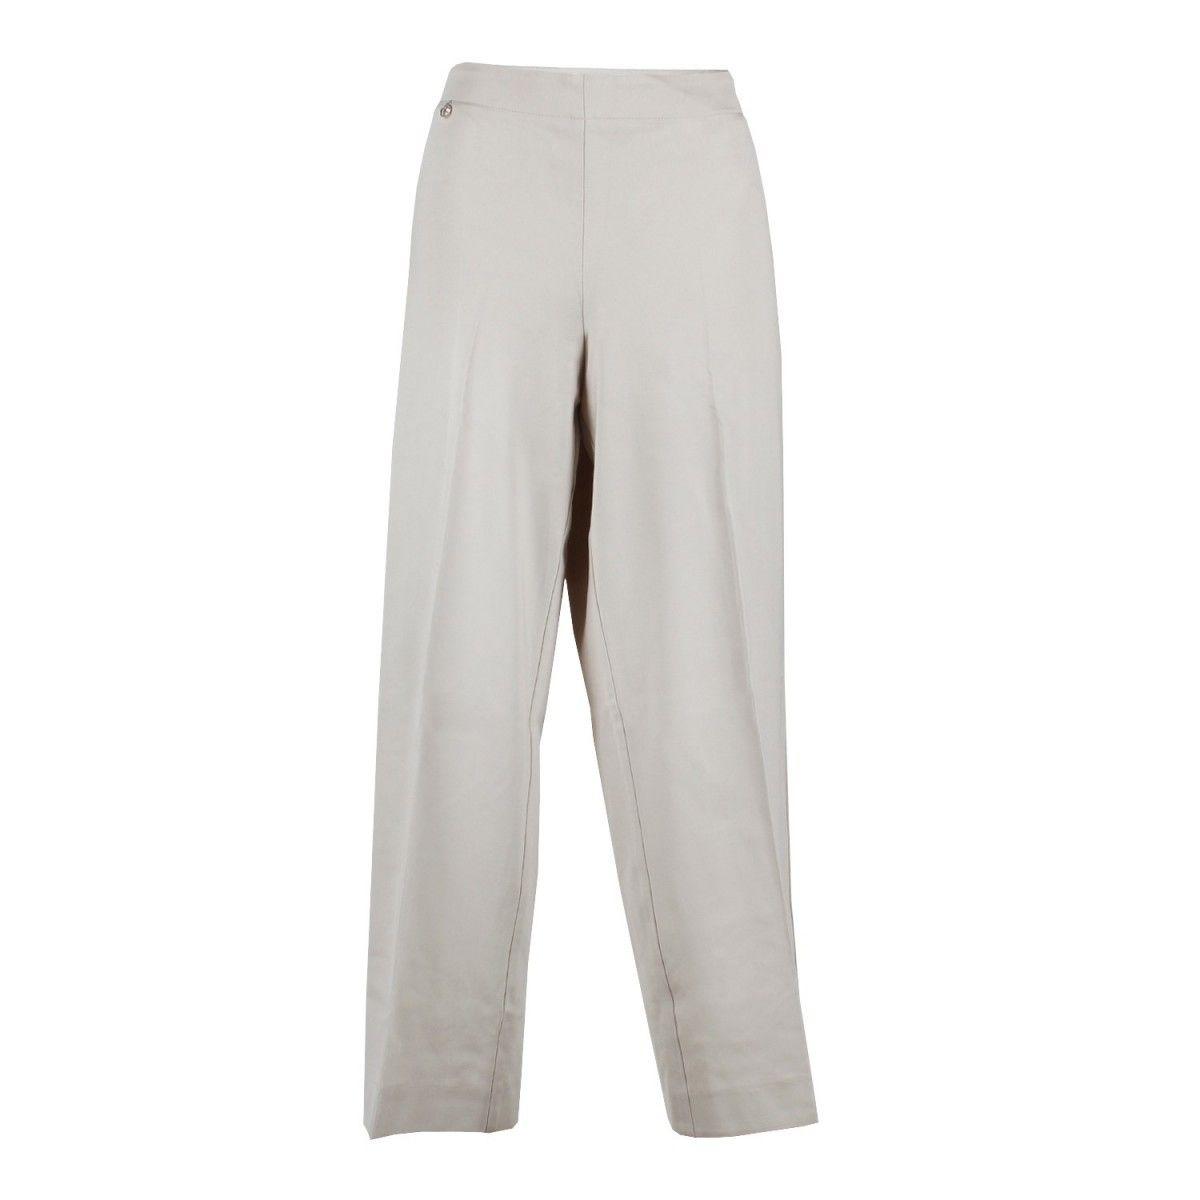 Nerogiardini Pantalone...